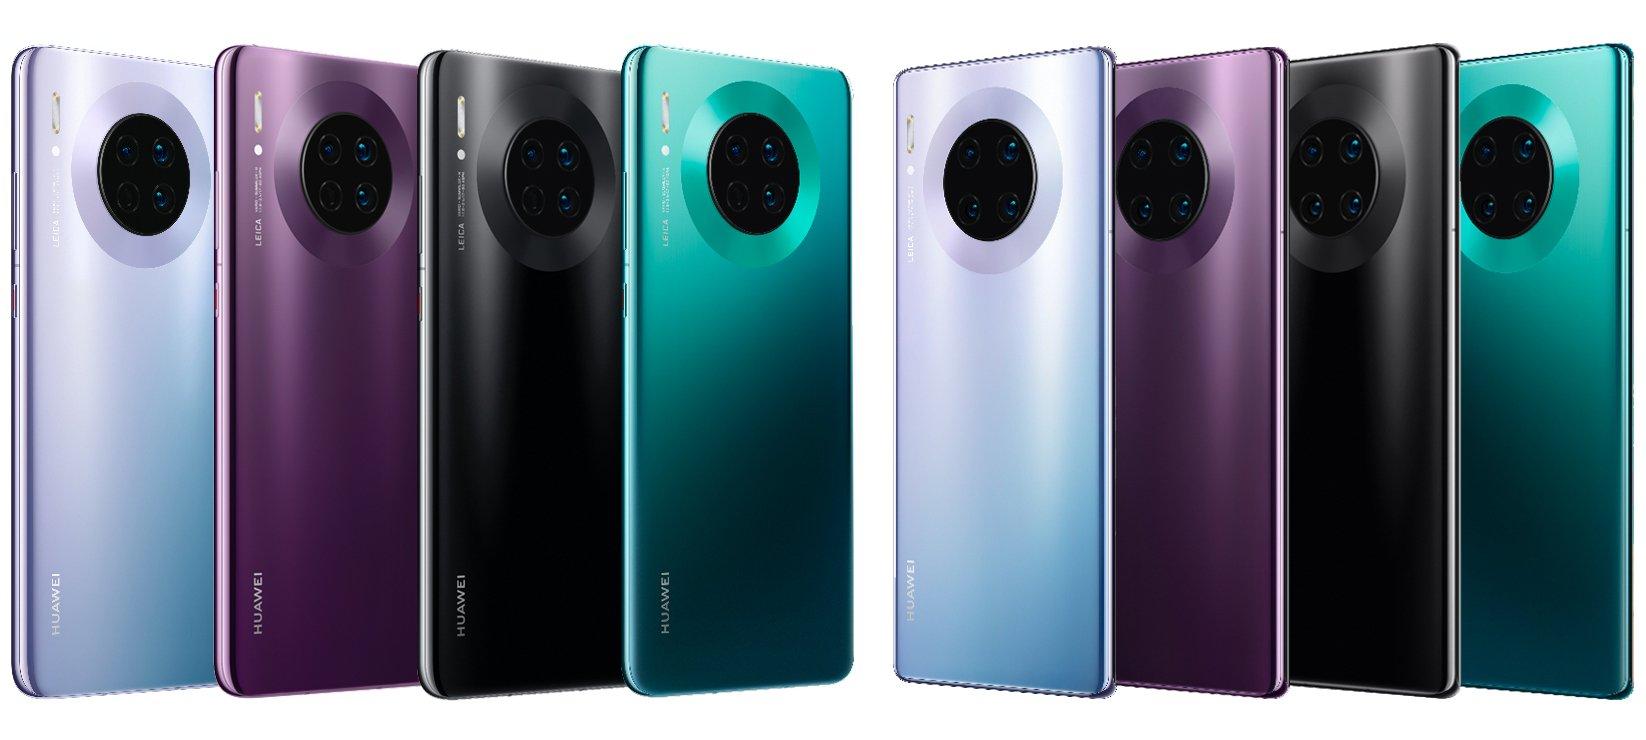 Huawei Mate 30, specyfikacja Huawei Mate 30, parametry Huawei Mate 30, Huawei Mate 30 Pro, specyfikacja Huawei Mate 30 Pro, parametry Huawei Mate 30 Pro,